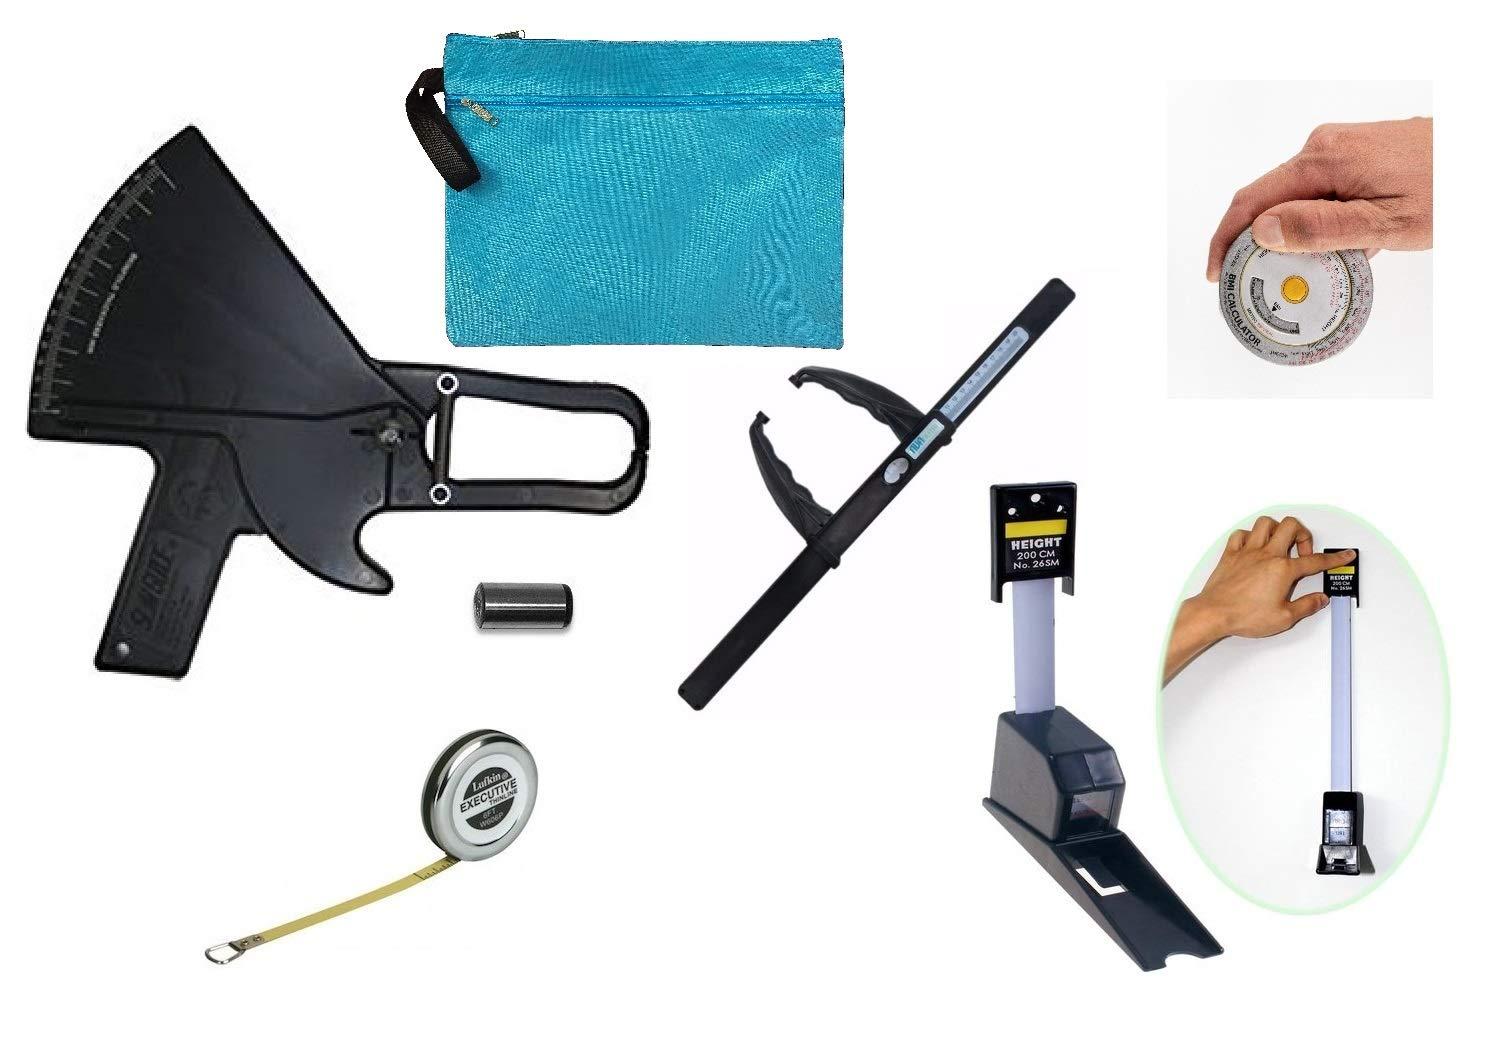 Skinfold Caliper Kit with Slim Guide, Stadiometer, Lufkin and BMI Tape Measure, Calibration Dowel, Bag